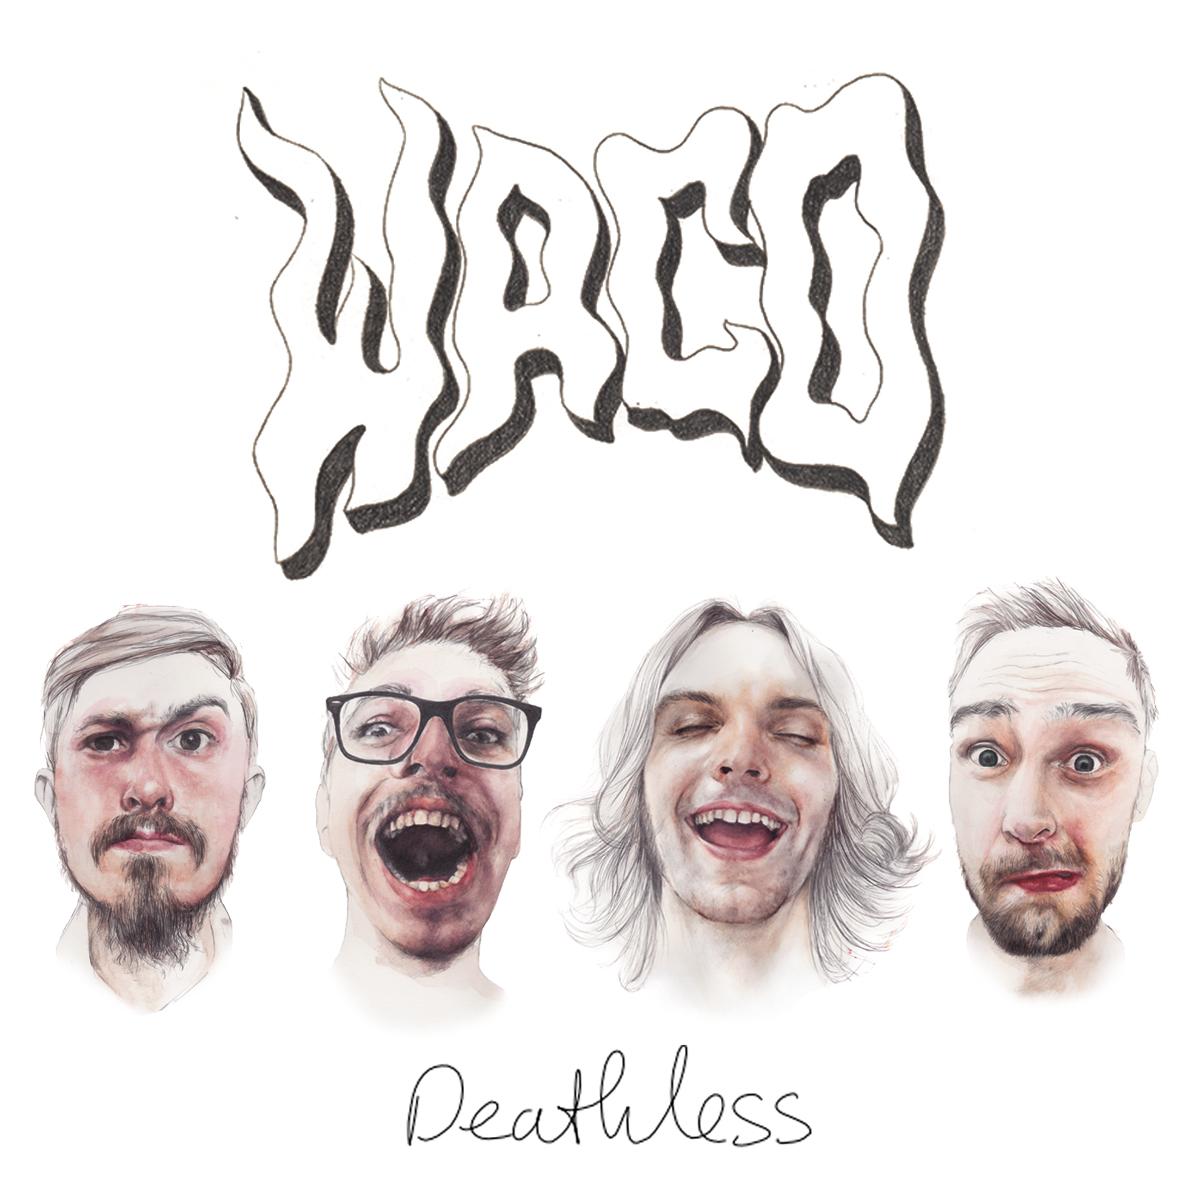 Waco Deathless